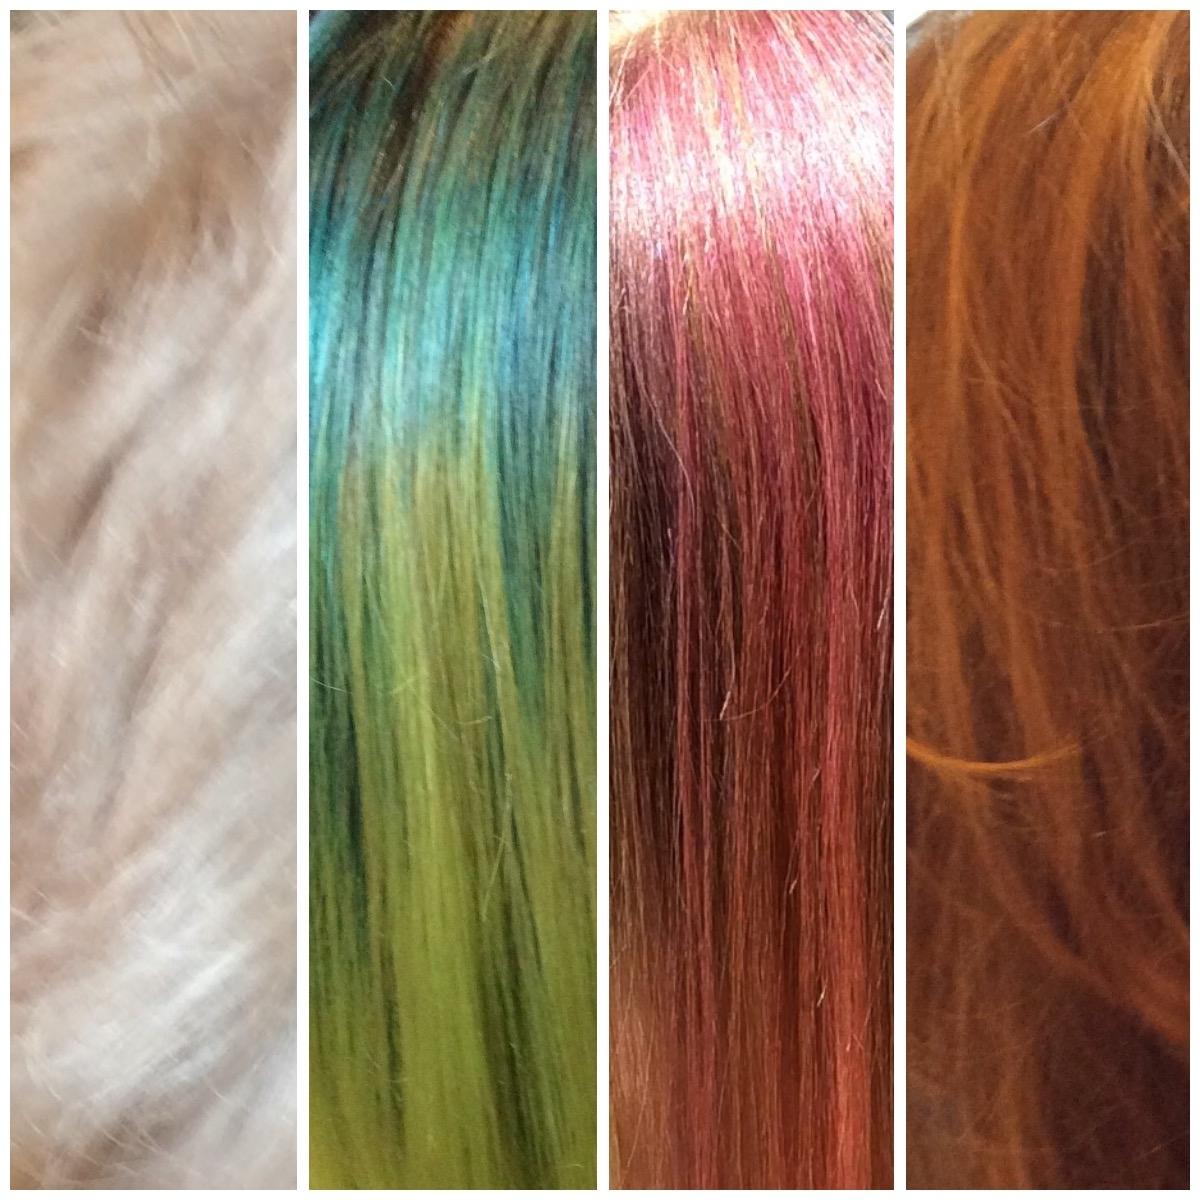 Rapunzel's Hair Design in Stratford